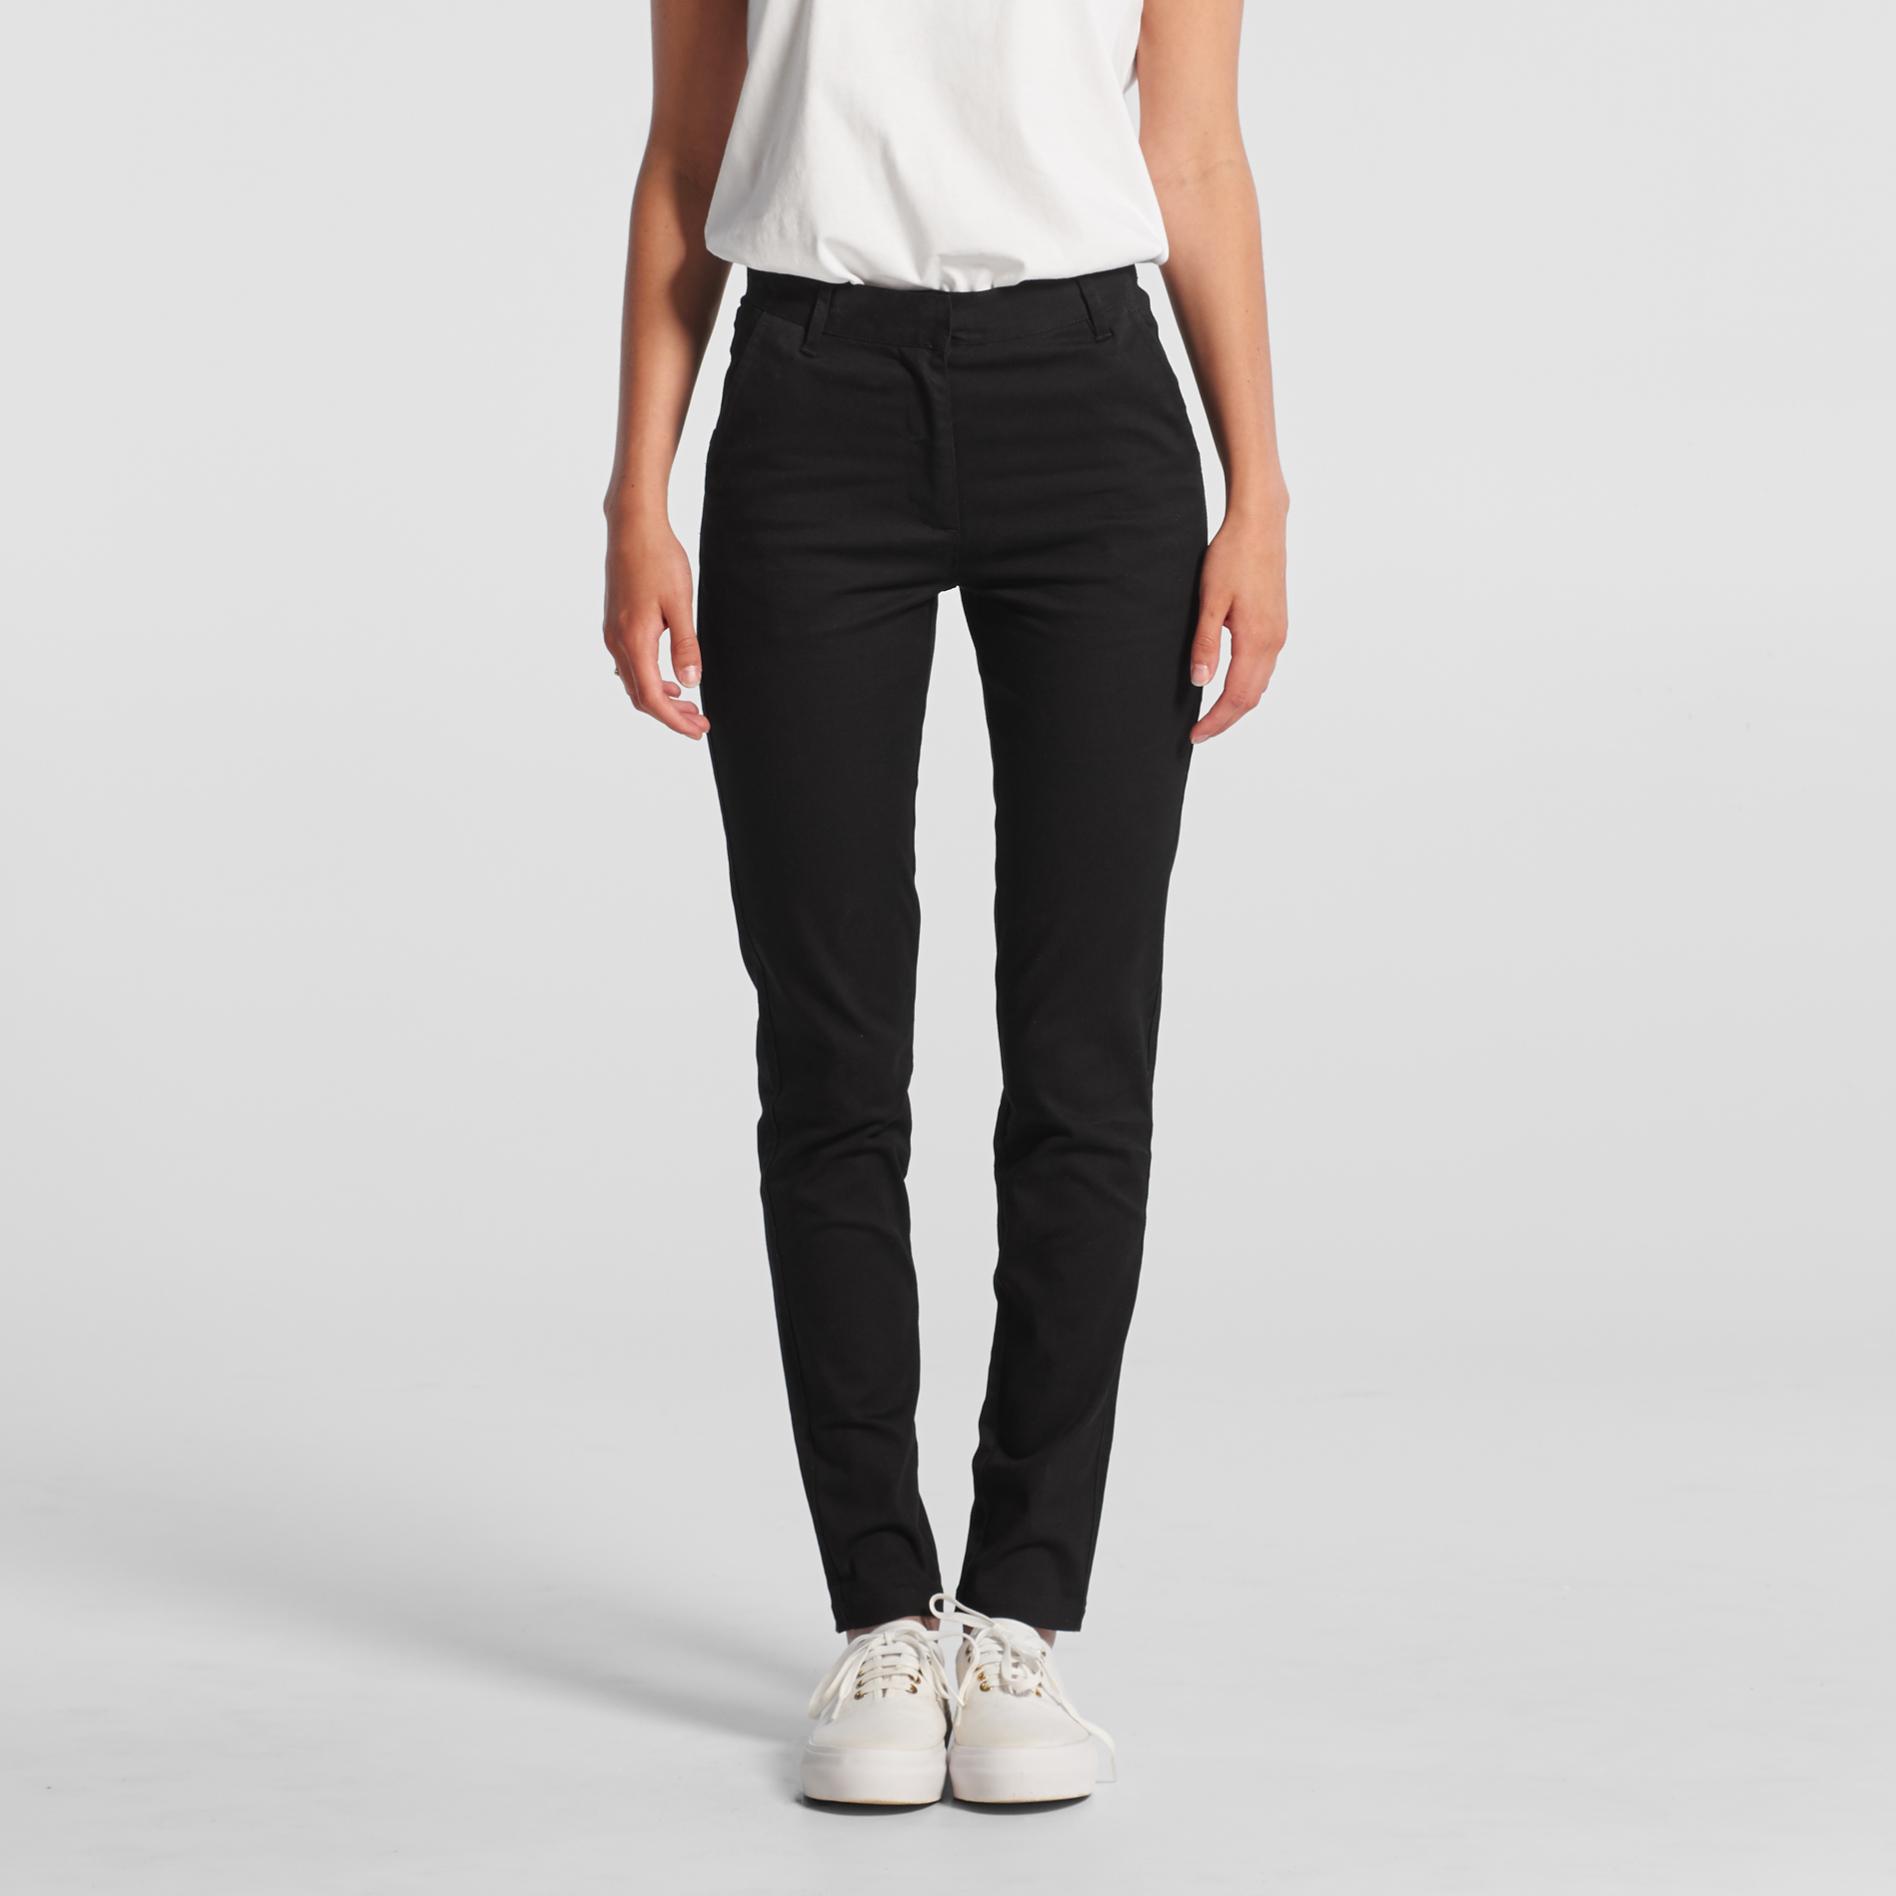 Womens Standard Pants (4901_AS)